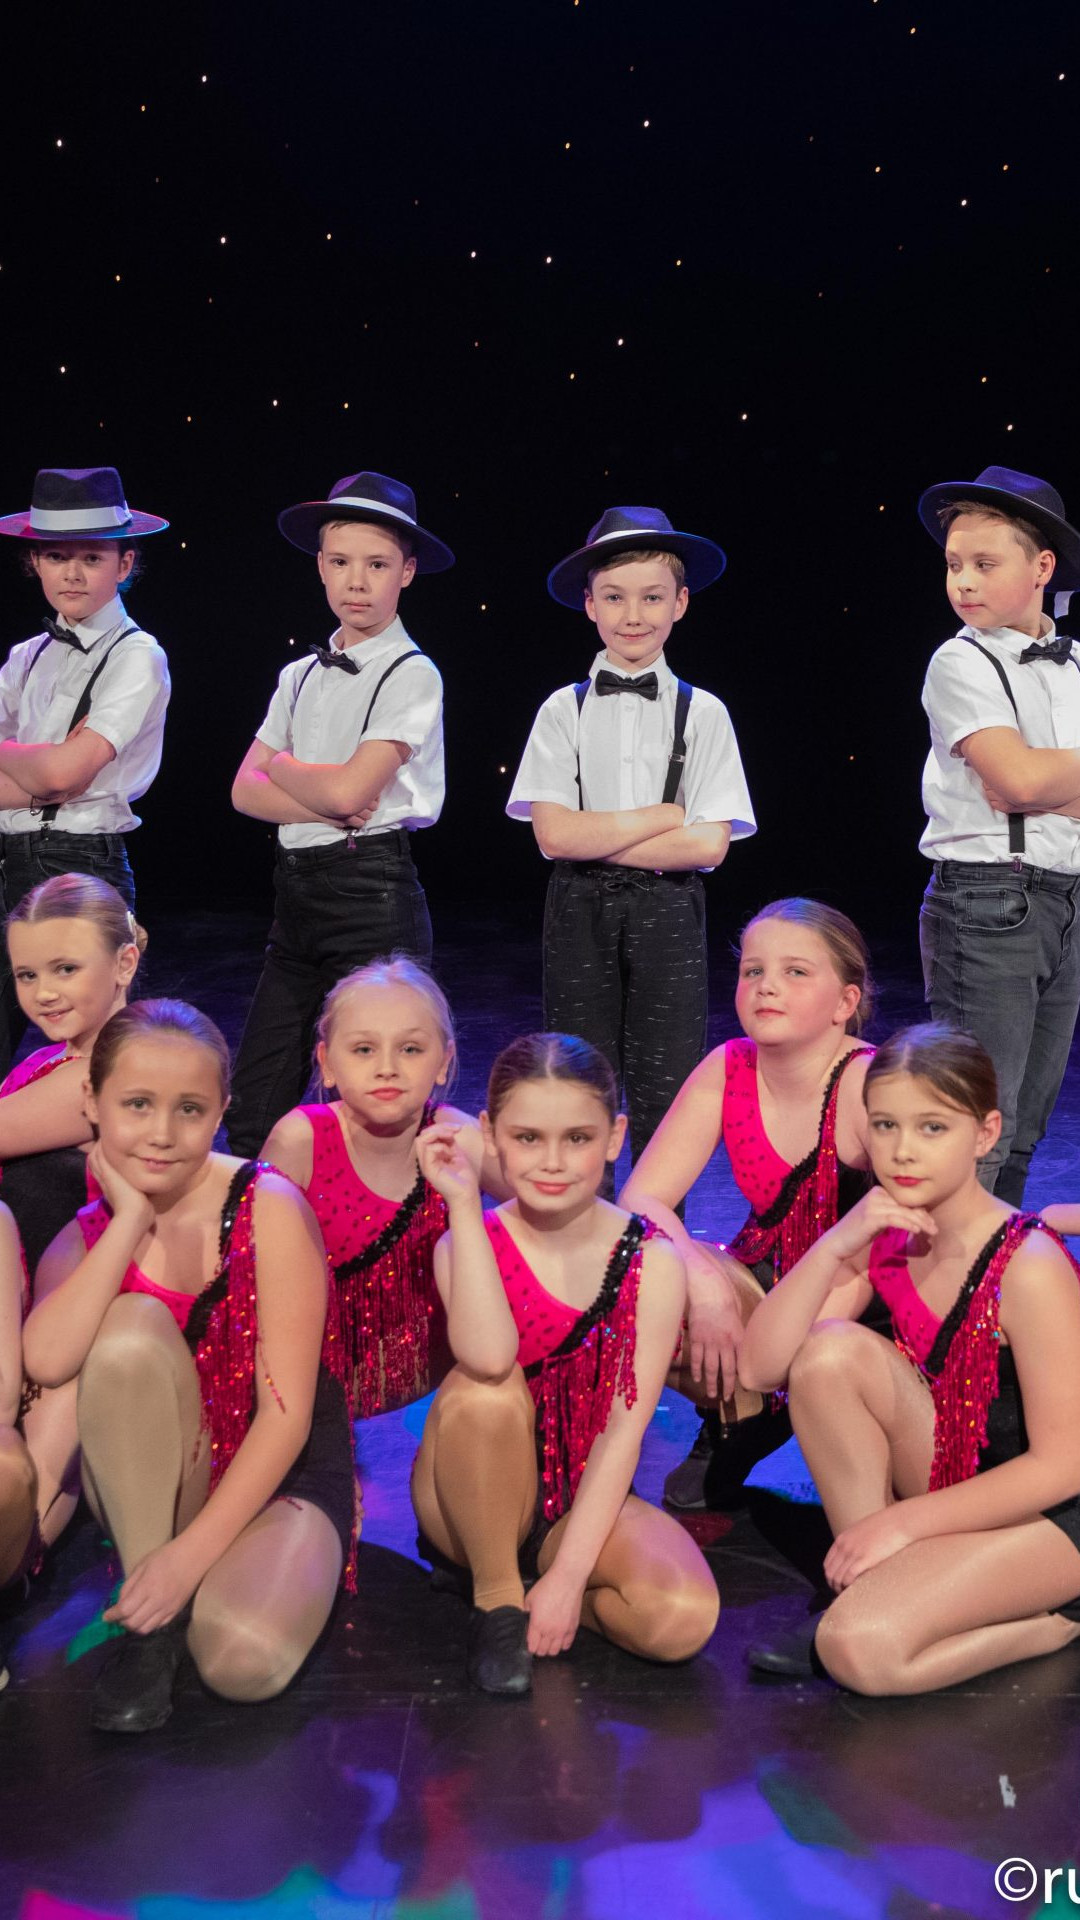 performing stars academy, Homepage